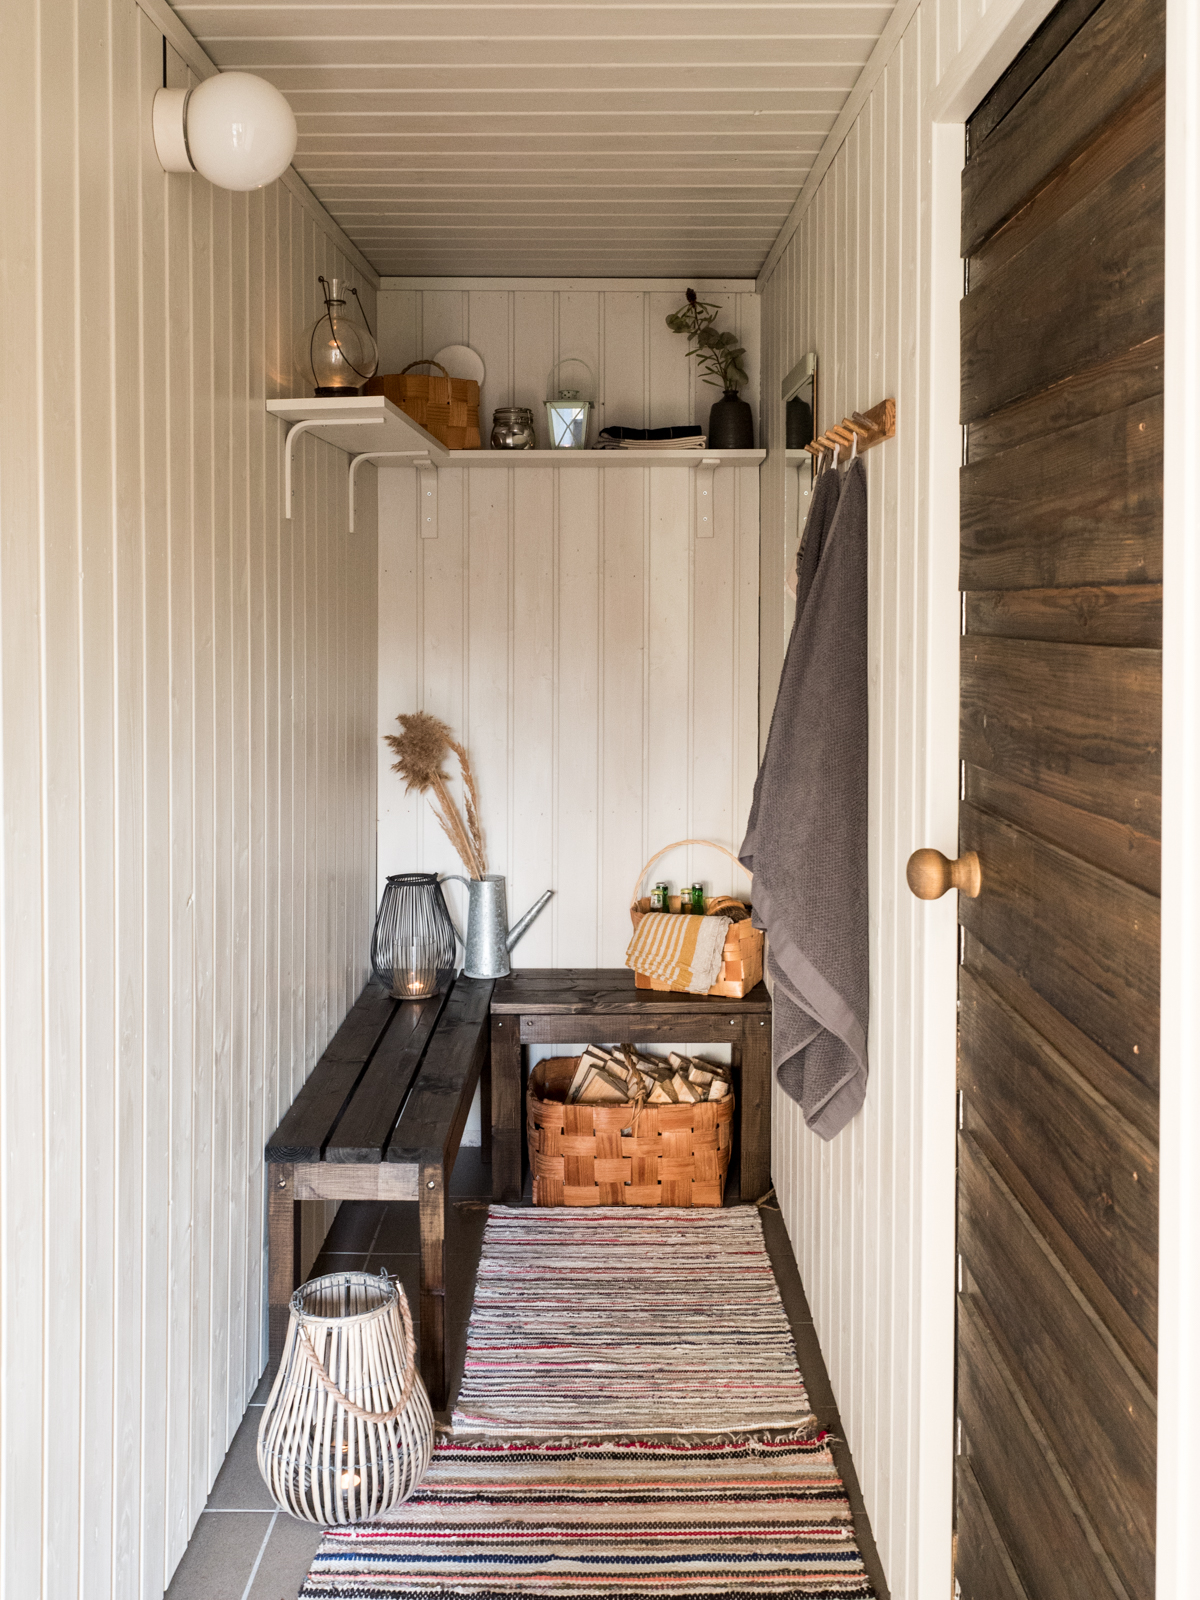 saunan pukuhuoneen remontti